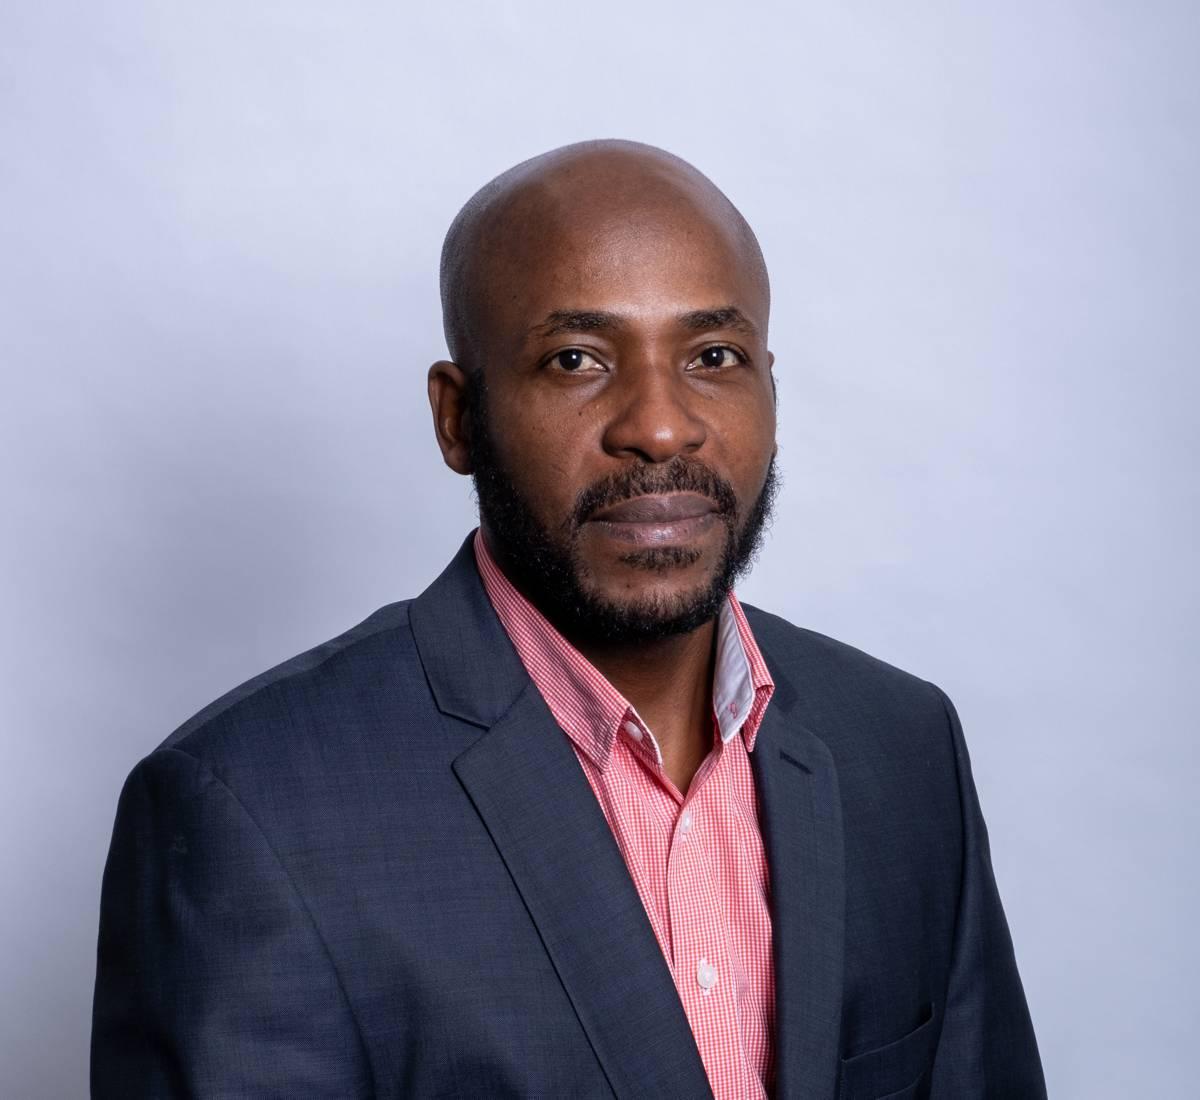 Garikayi Madzudzo, Advanced Cybersecurity Research Scientist at HORIBA MIRA